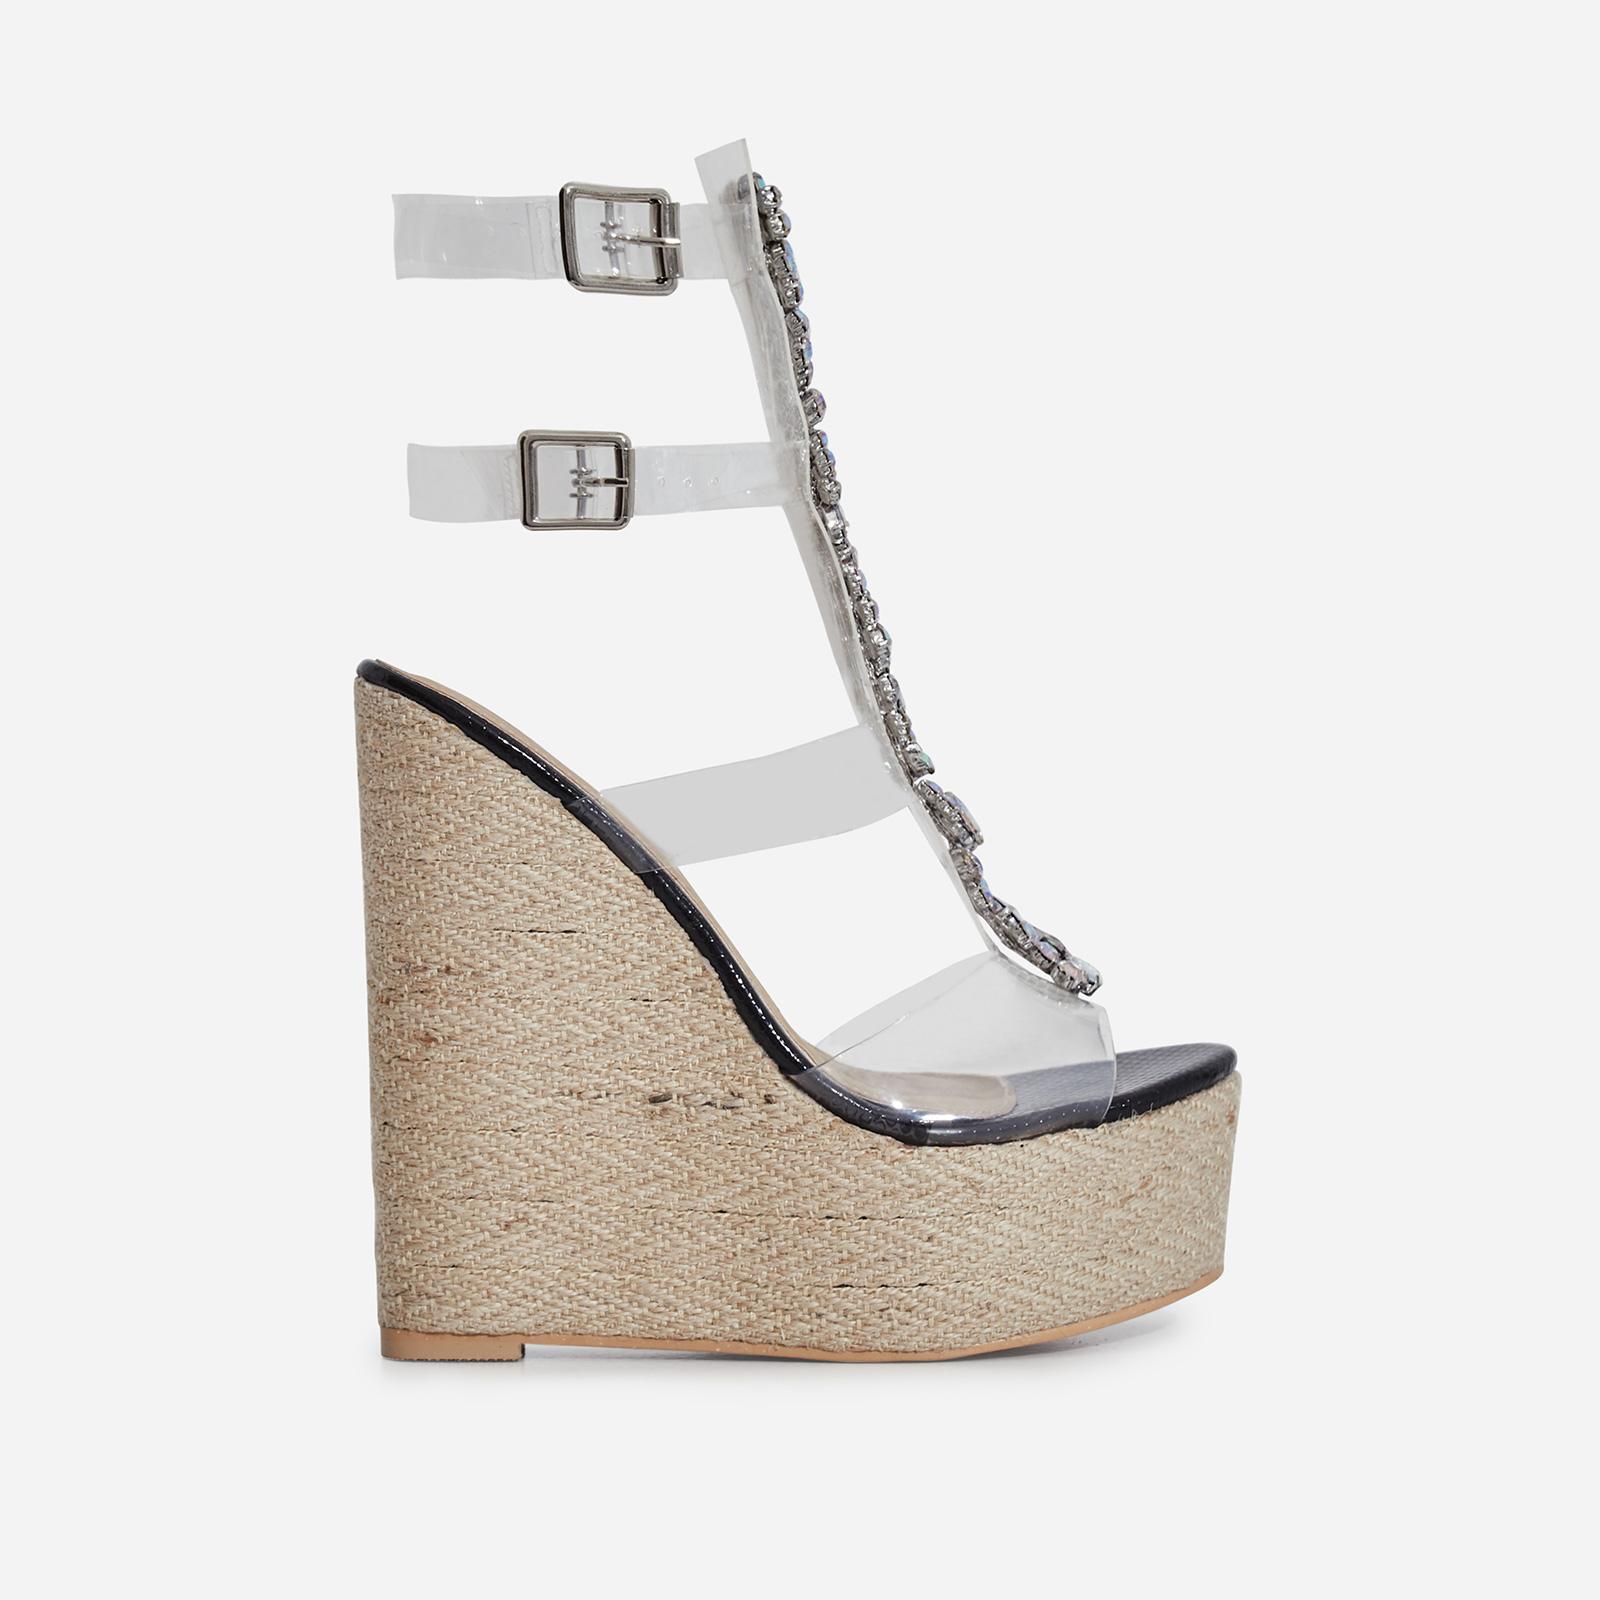 Heir Jewel Embellished Perspex Platform Espadrille Wedge Heel In Black Snake Print Faux Leather